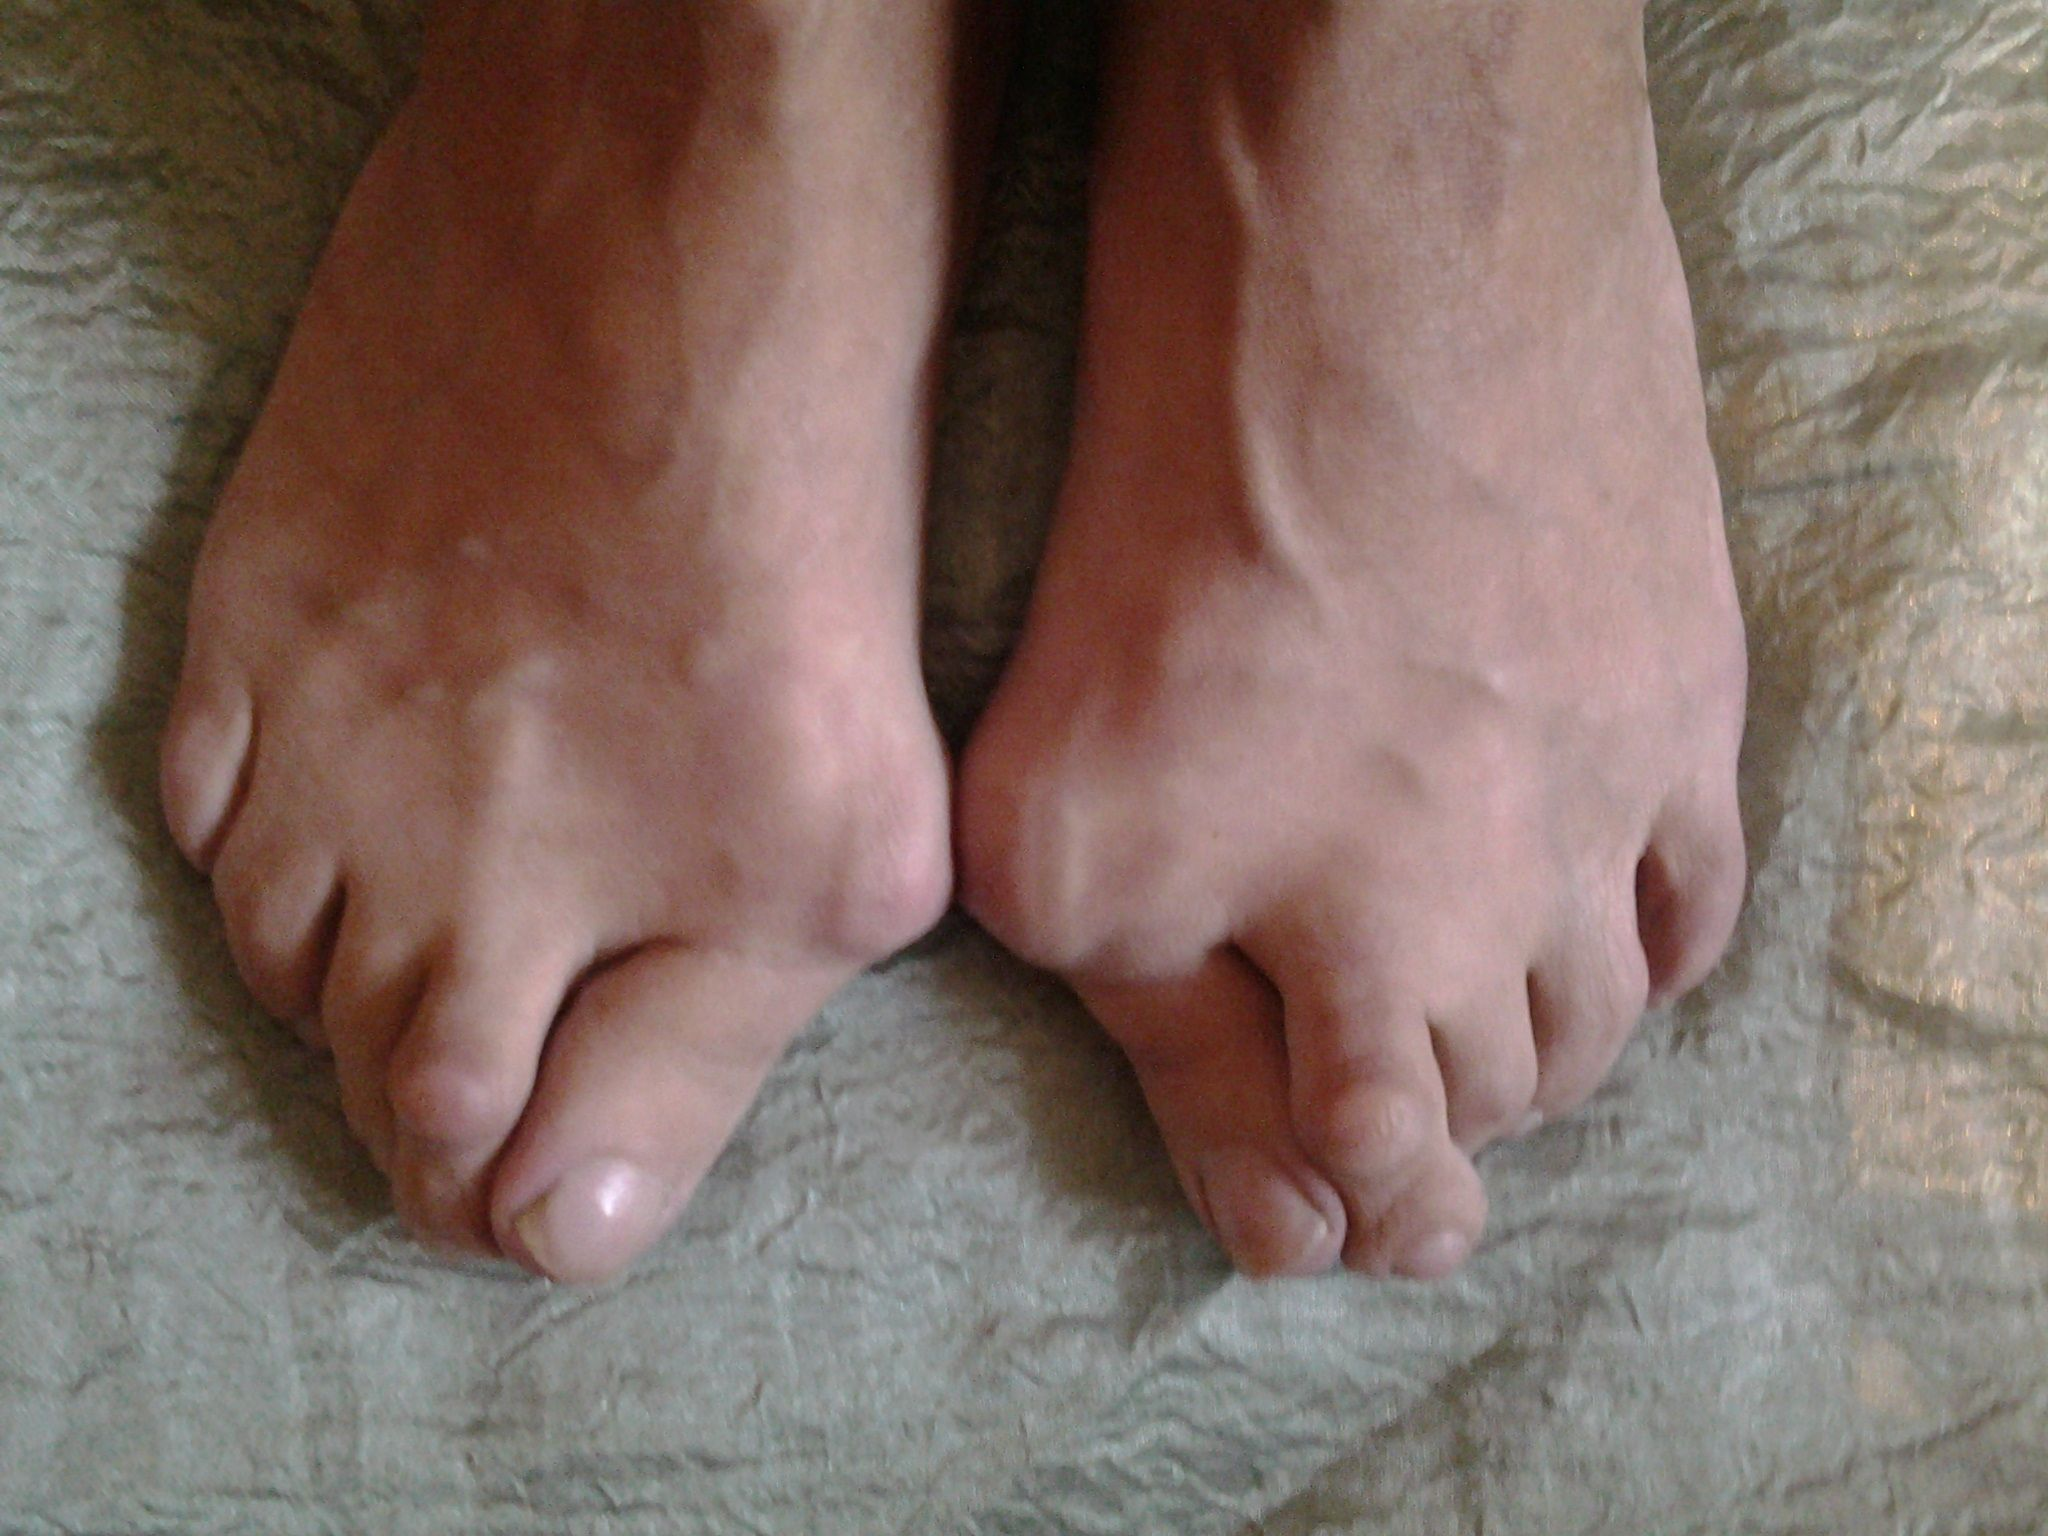 причины возникновения артроза коленного сустава